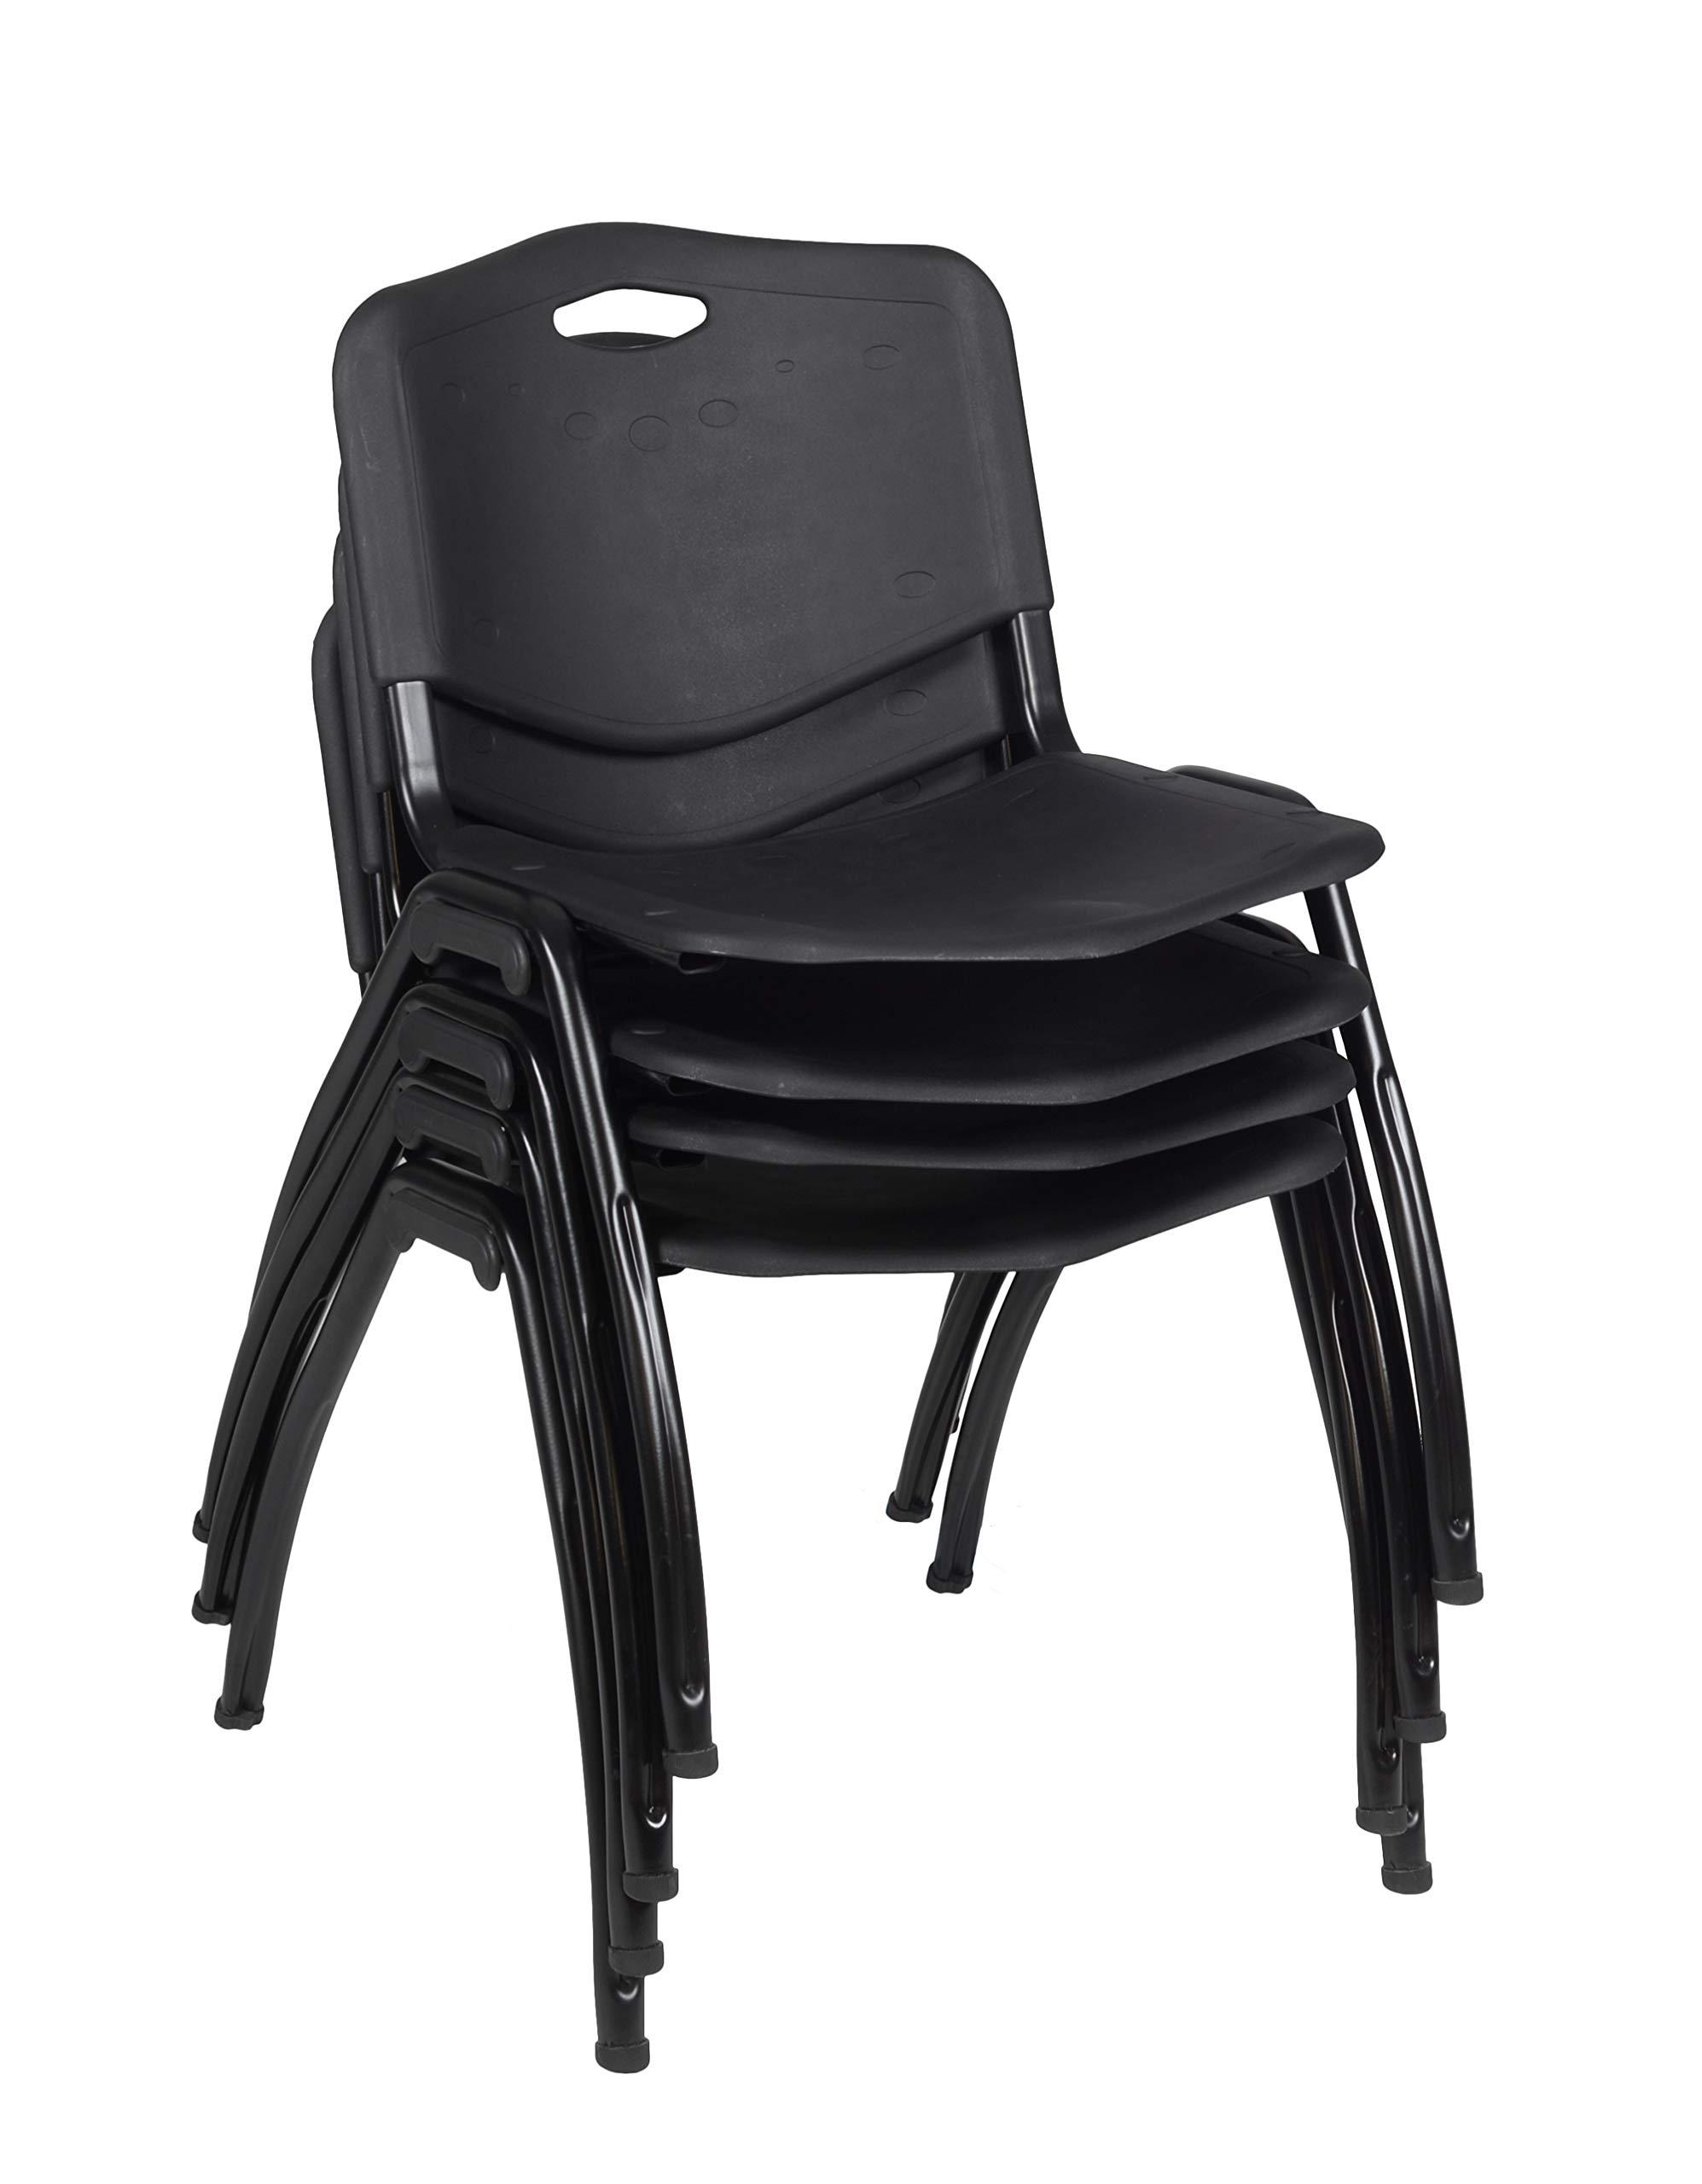 Regency 4700BK4PK M' Stack Chair (4 Pack), Black